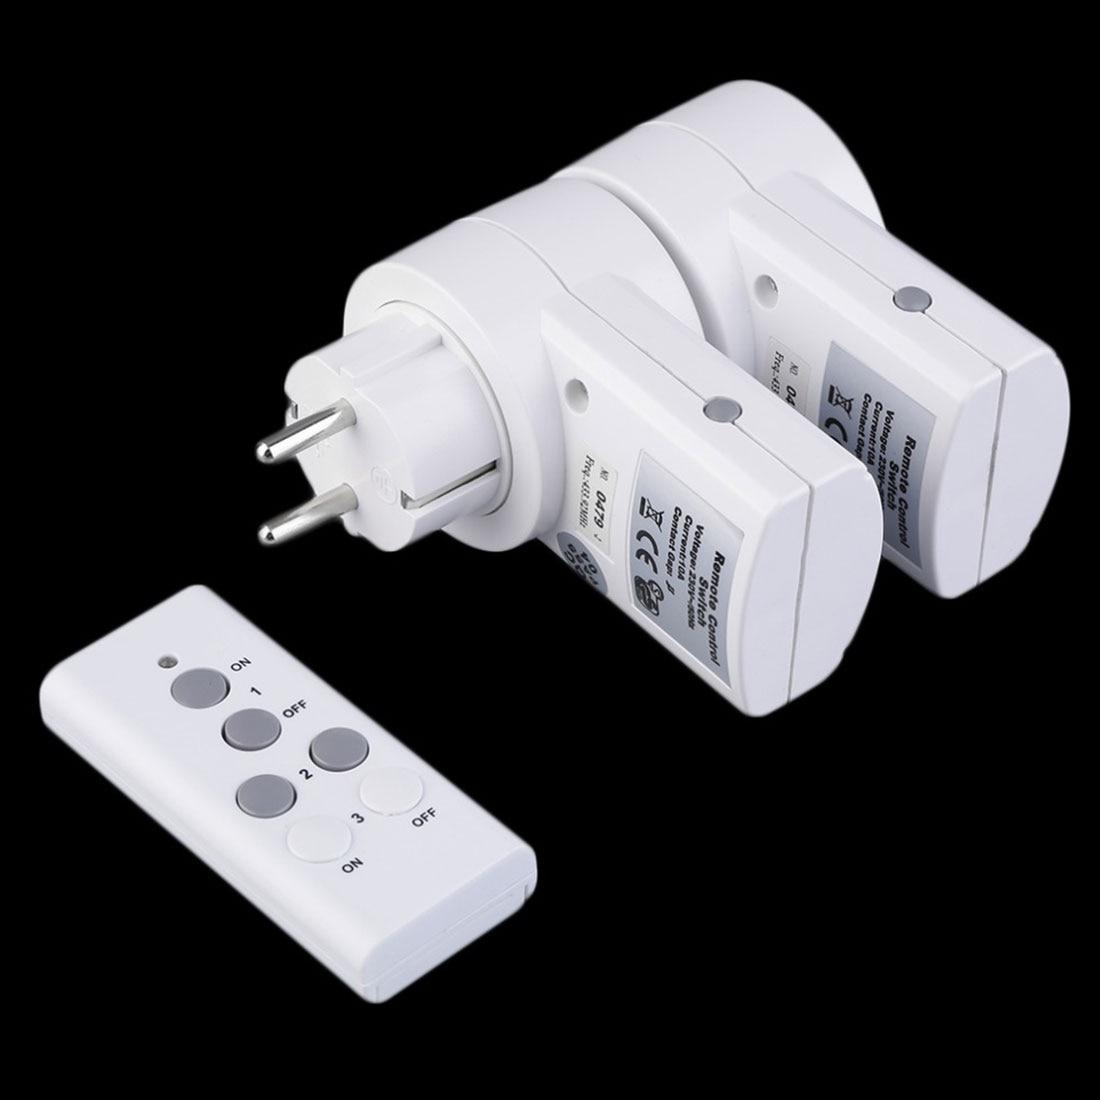 MAIF High Quality EU Plug 2pcs Socket/Pack 230v-50Hz 10A Remote Control Wireless Power Outlets Light Switch Socket DC 12V 23A gp 23a battery pack